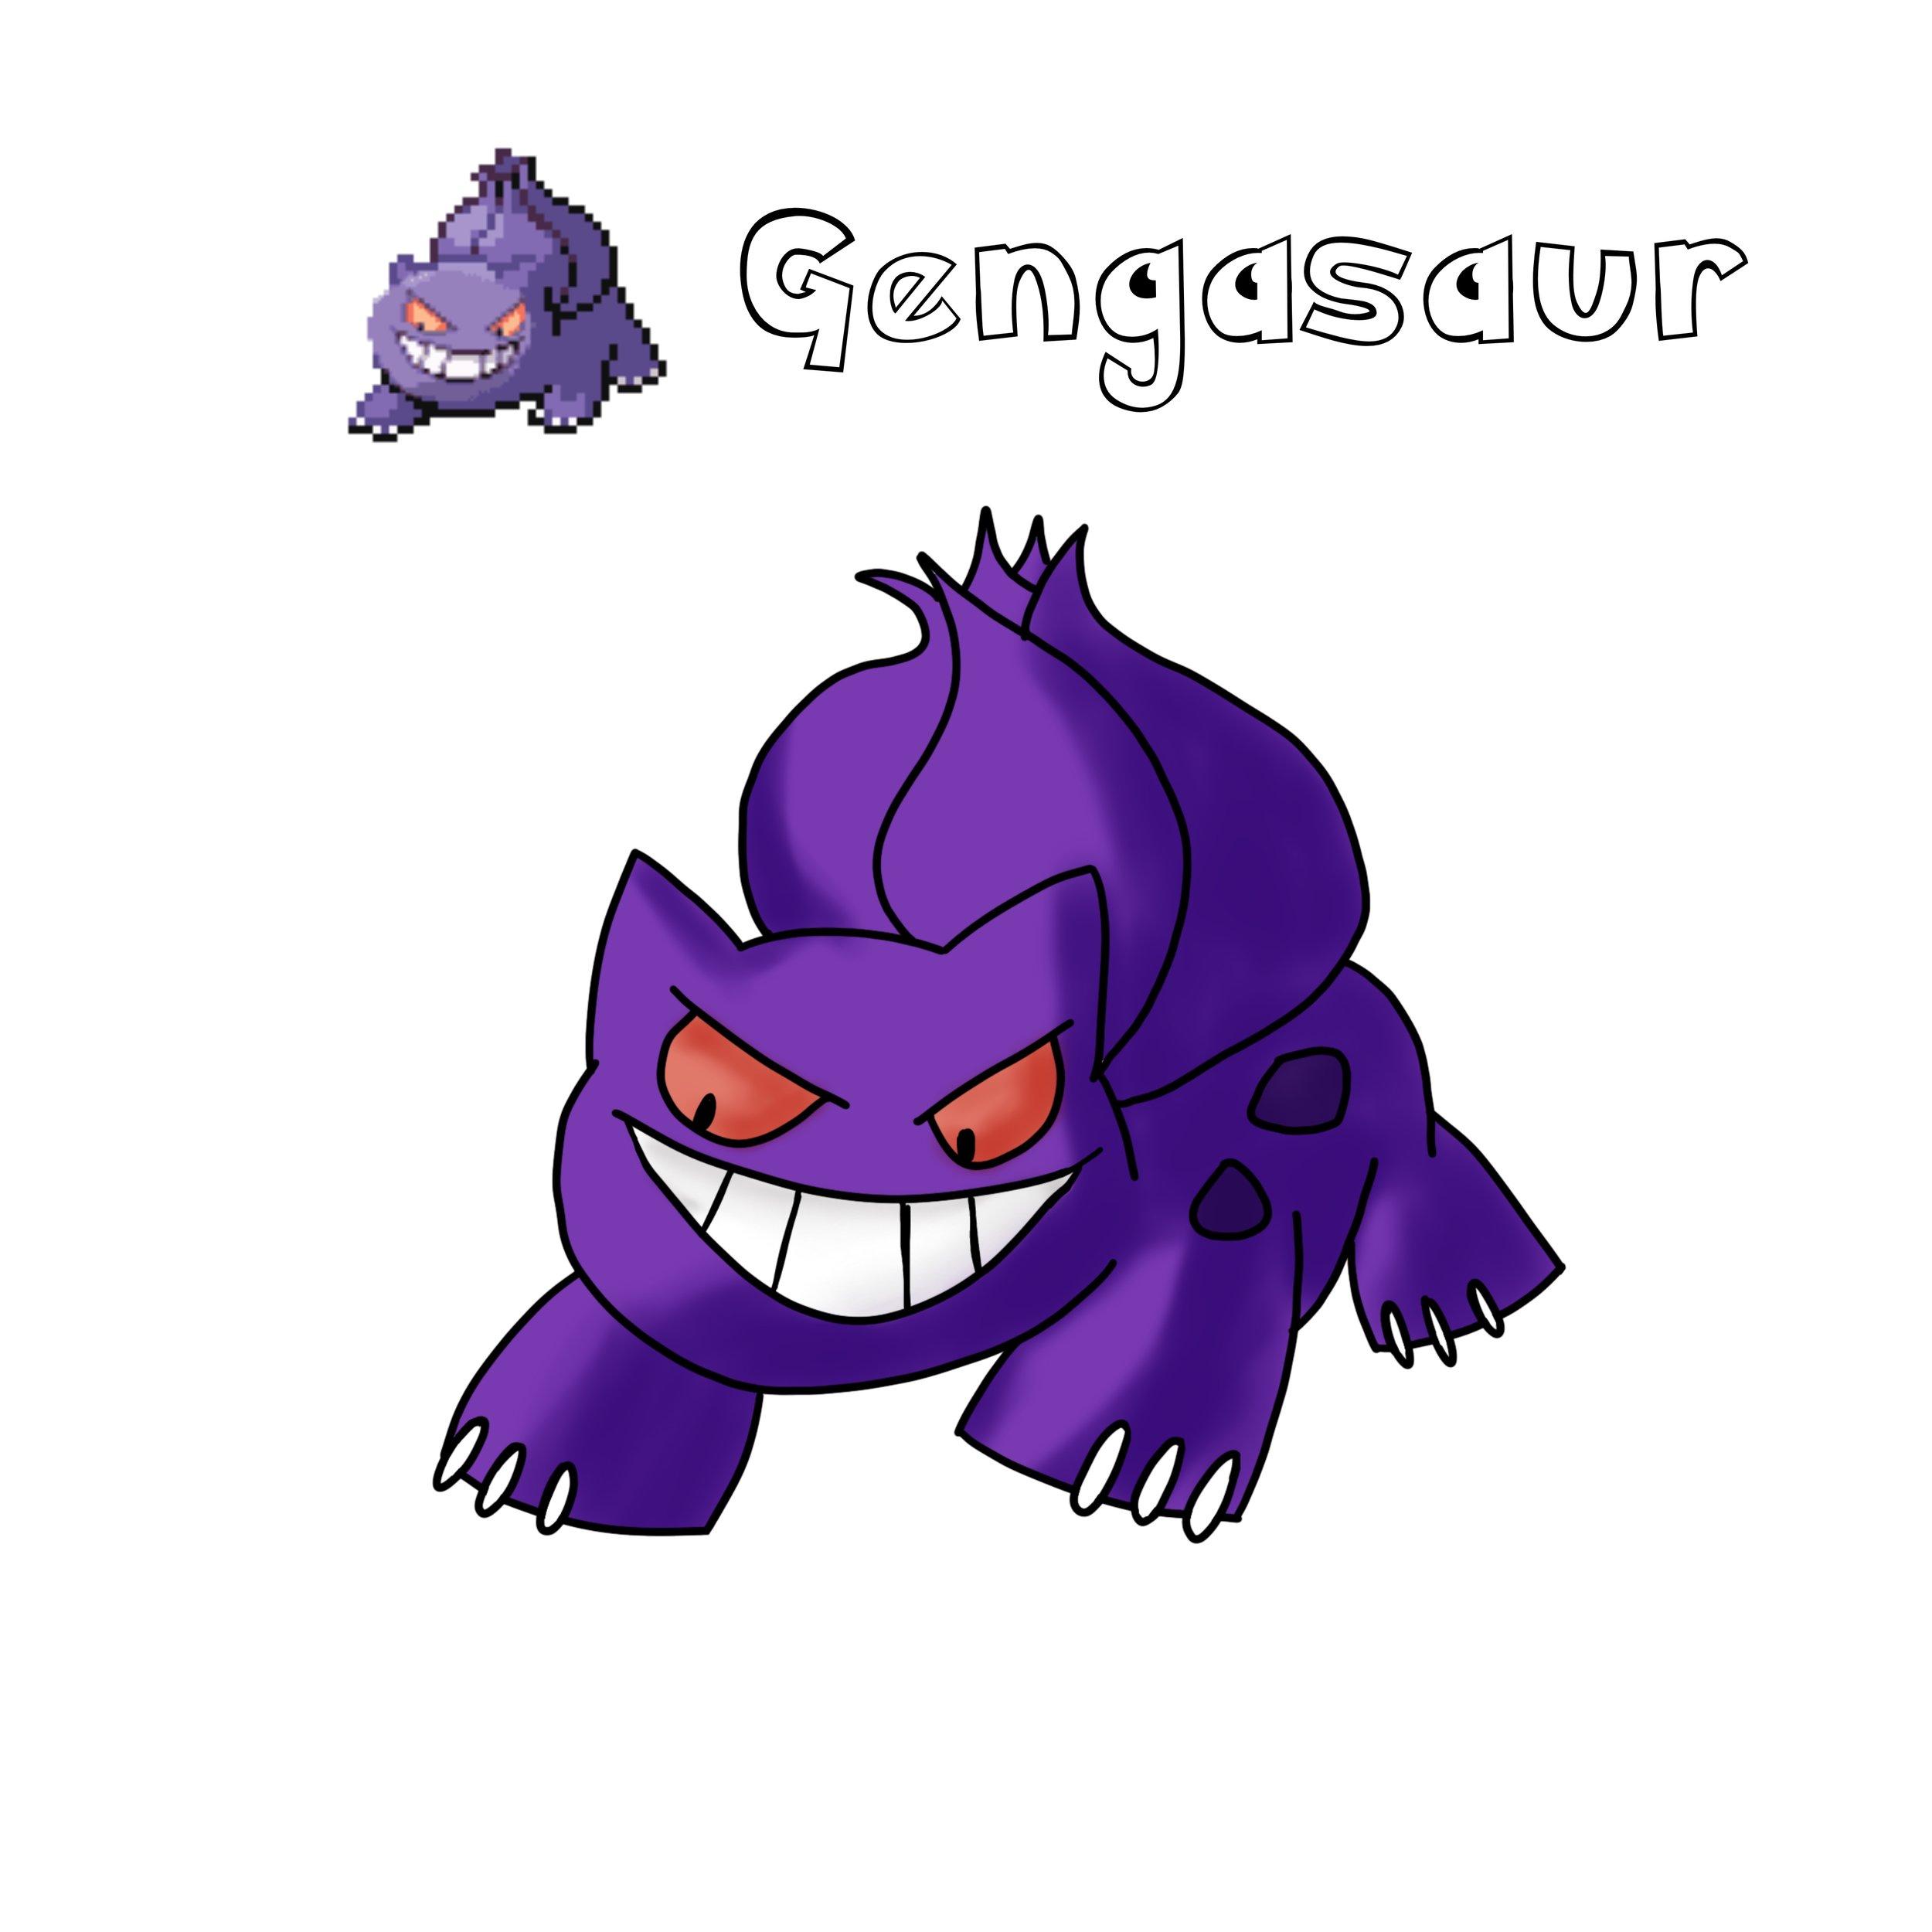 Gengasaur